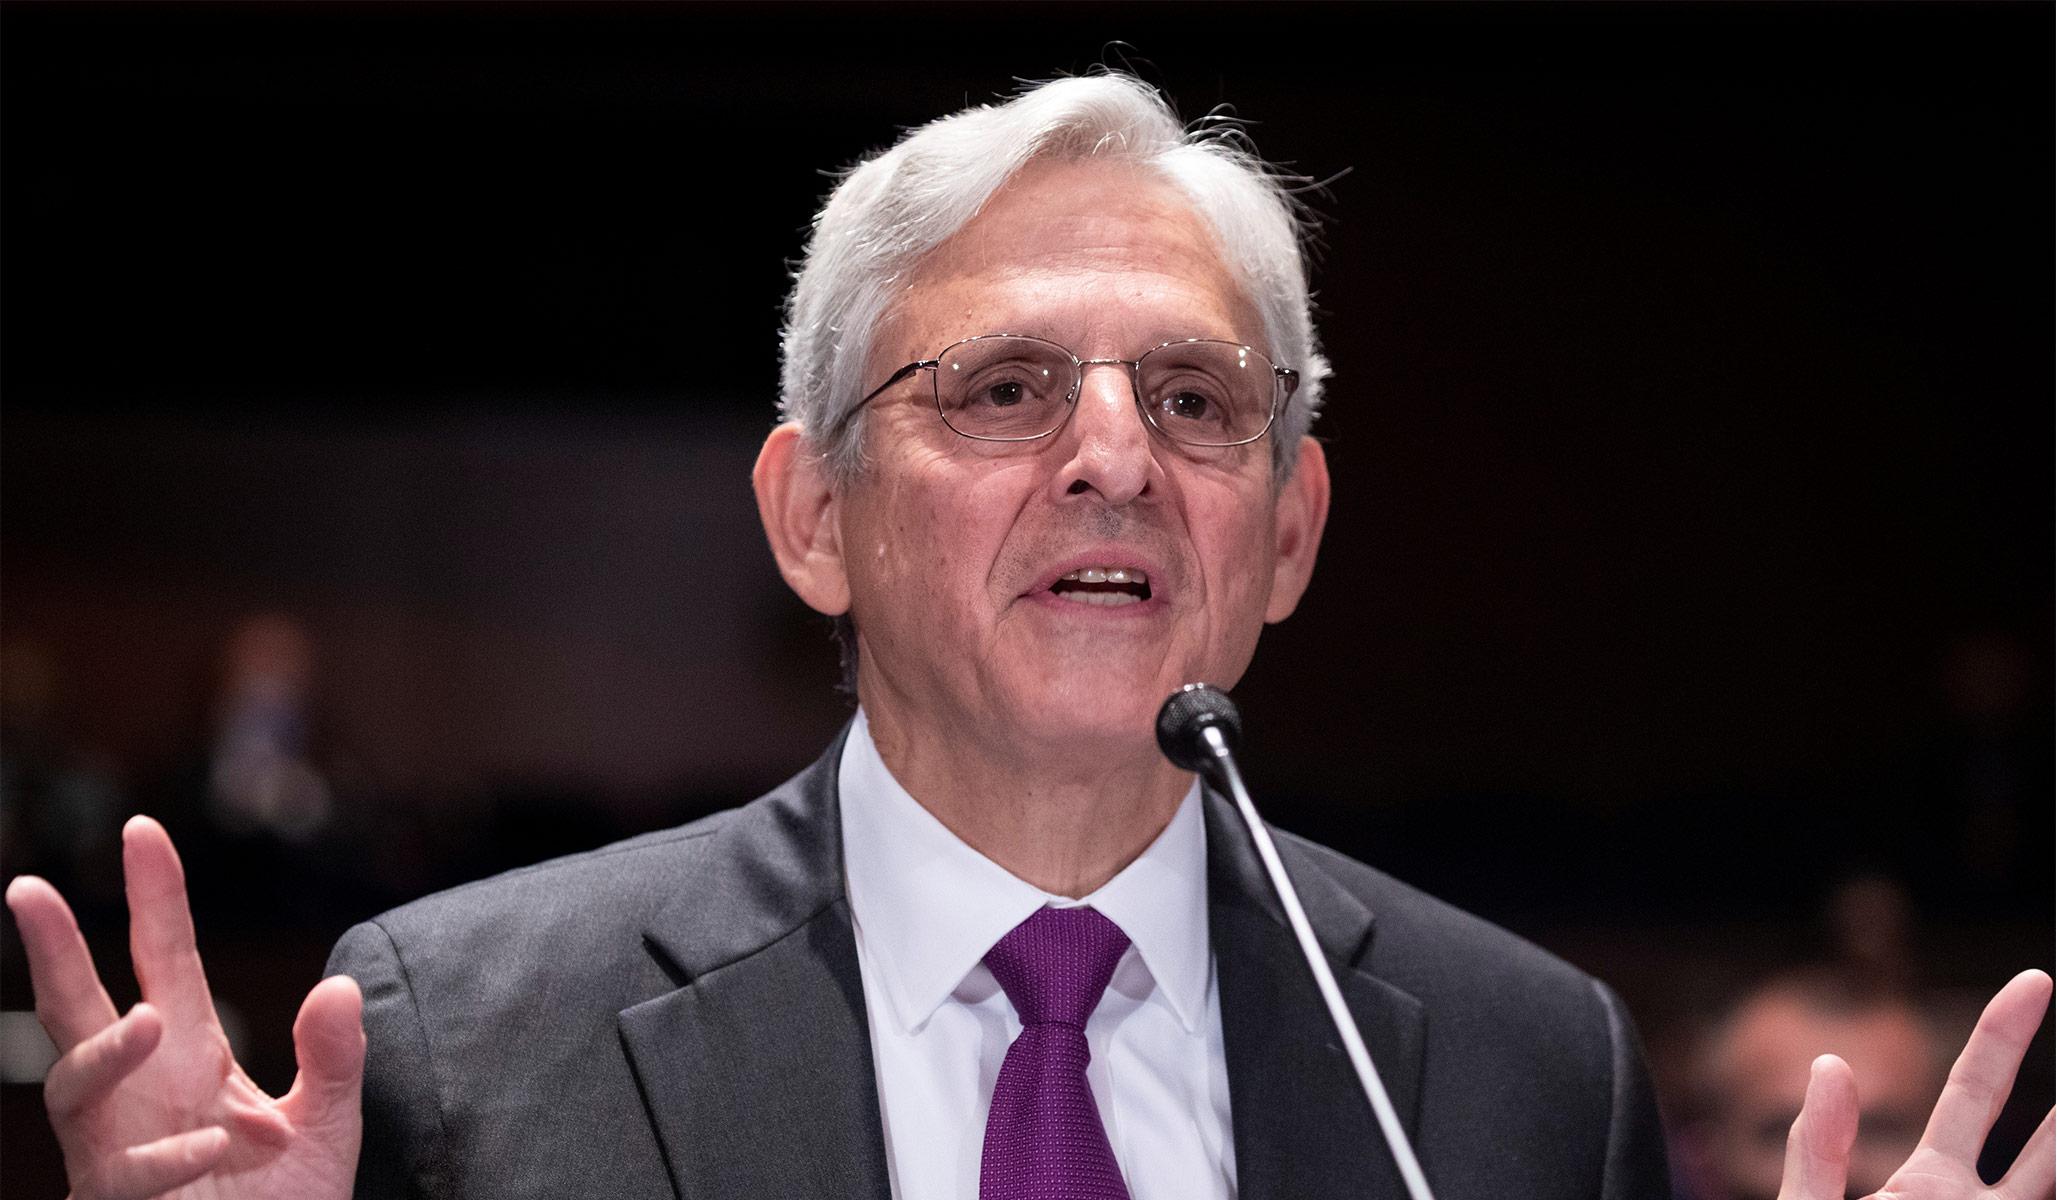 AG Garland Menolak Memo Dewan Sekolah Mewakili Konflik Kepentingan Mengingat Ikatan Keluarga dengan Perusahaan Pendidikan Progresif